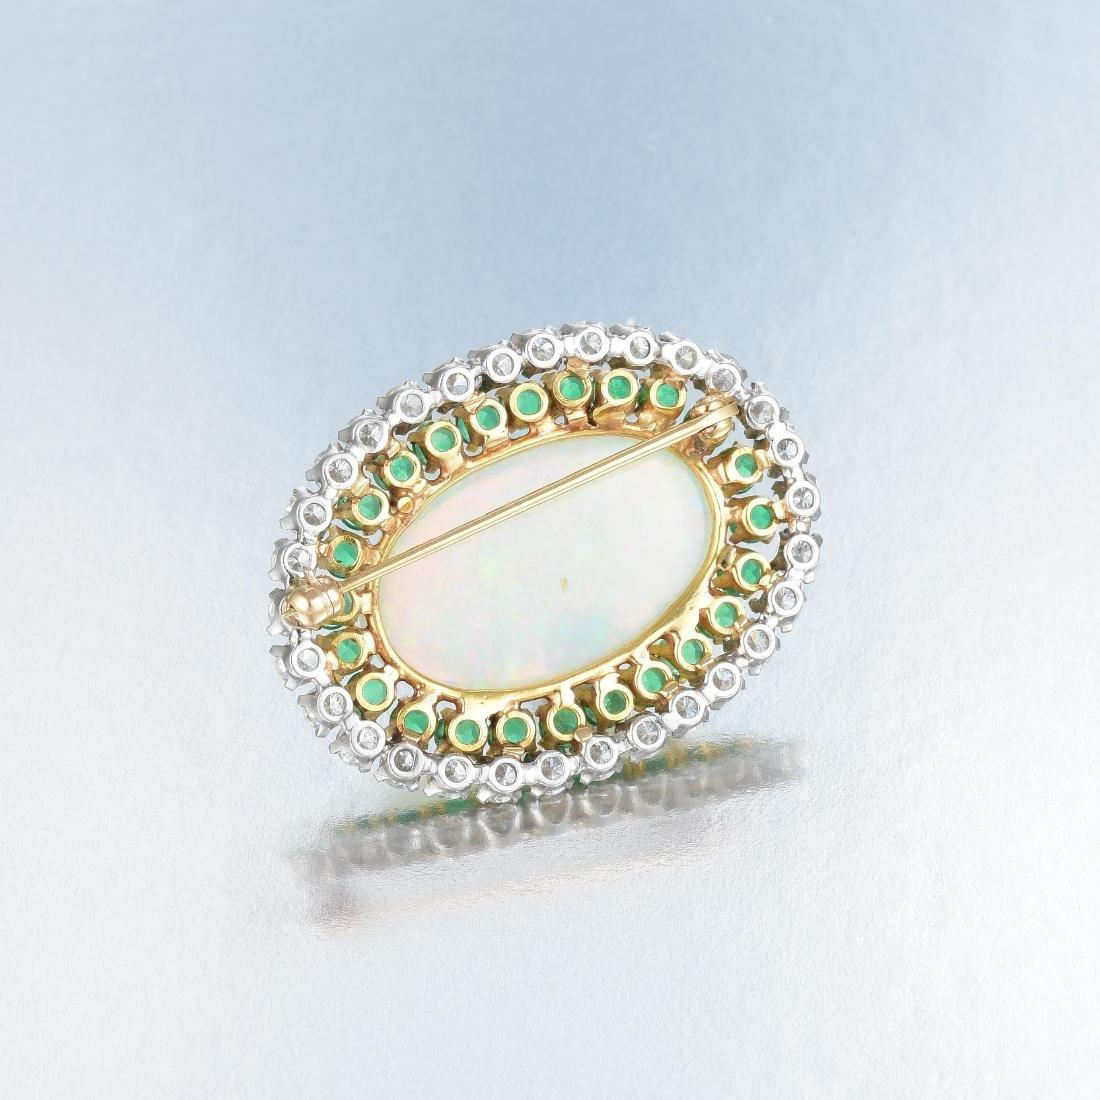 An Opal, Diamond and Emerald Pin - 2